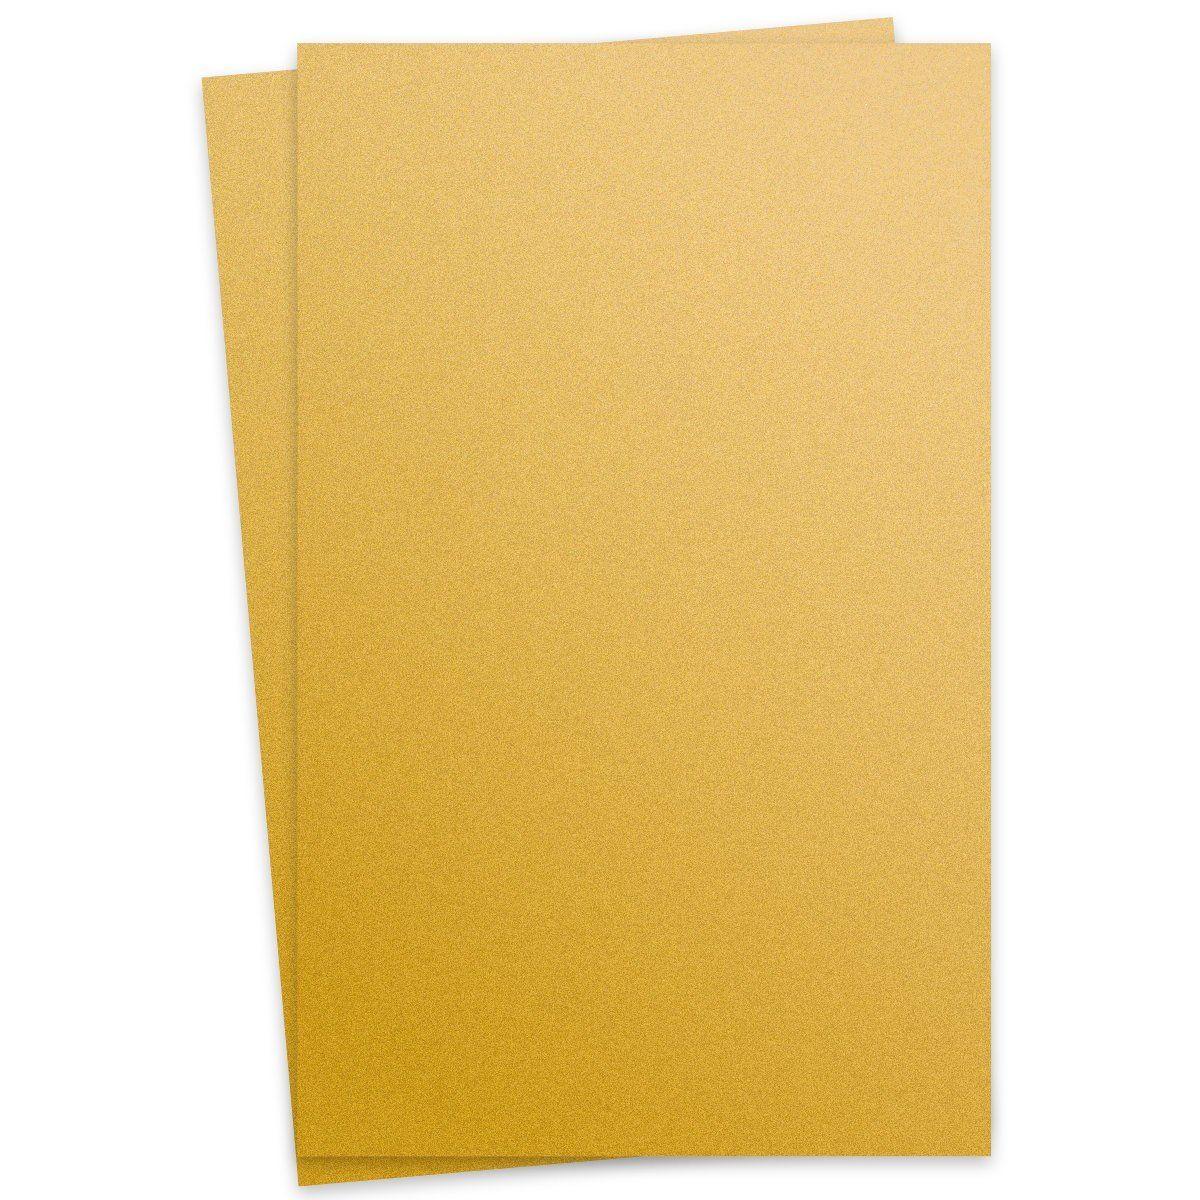 Curious Metallic Super Gold 11x17 Paper 32 80lb Text 200 Pk In 2020 Cardstock Paper Gold Paper Paper